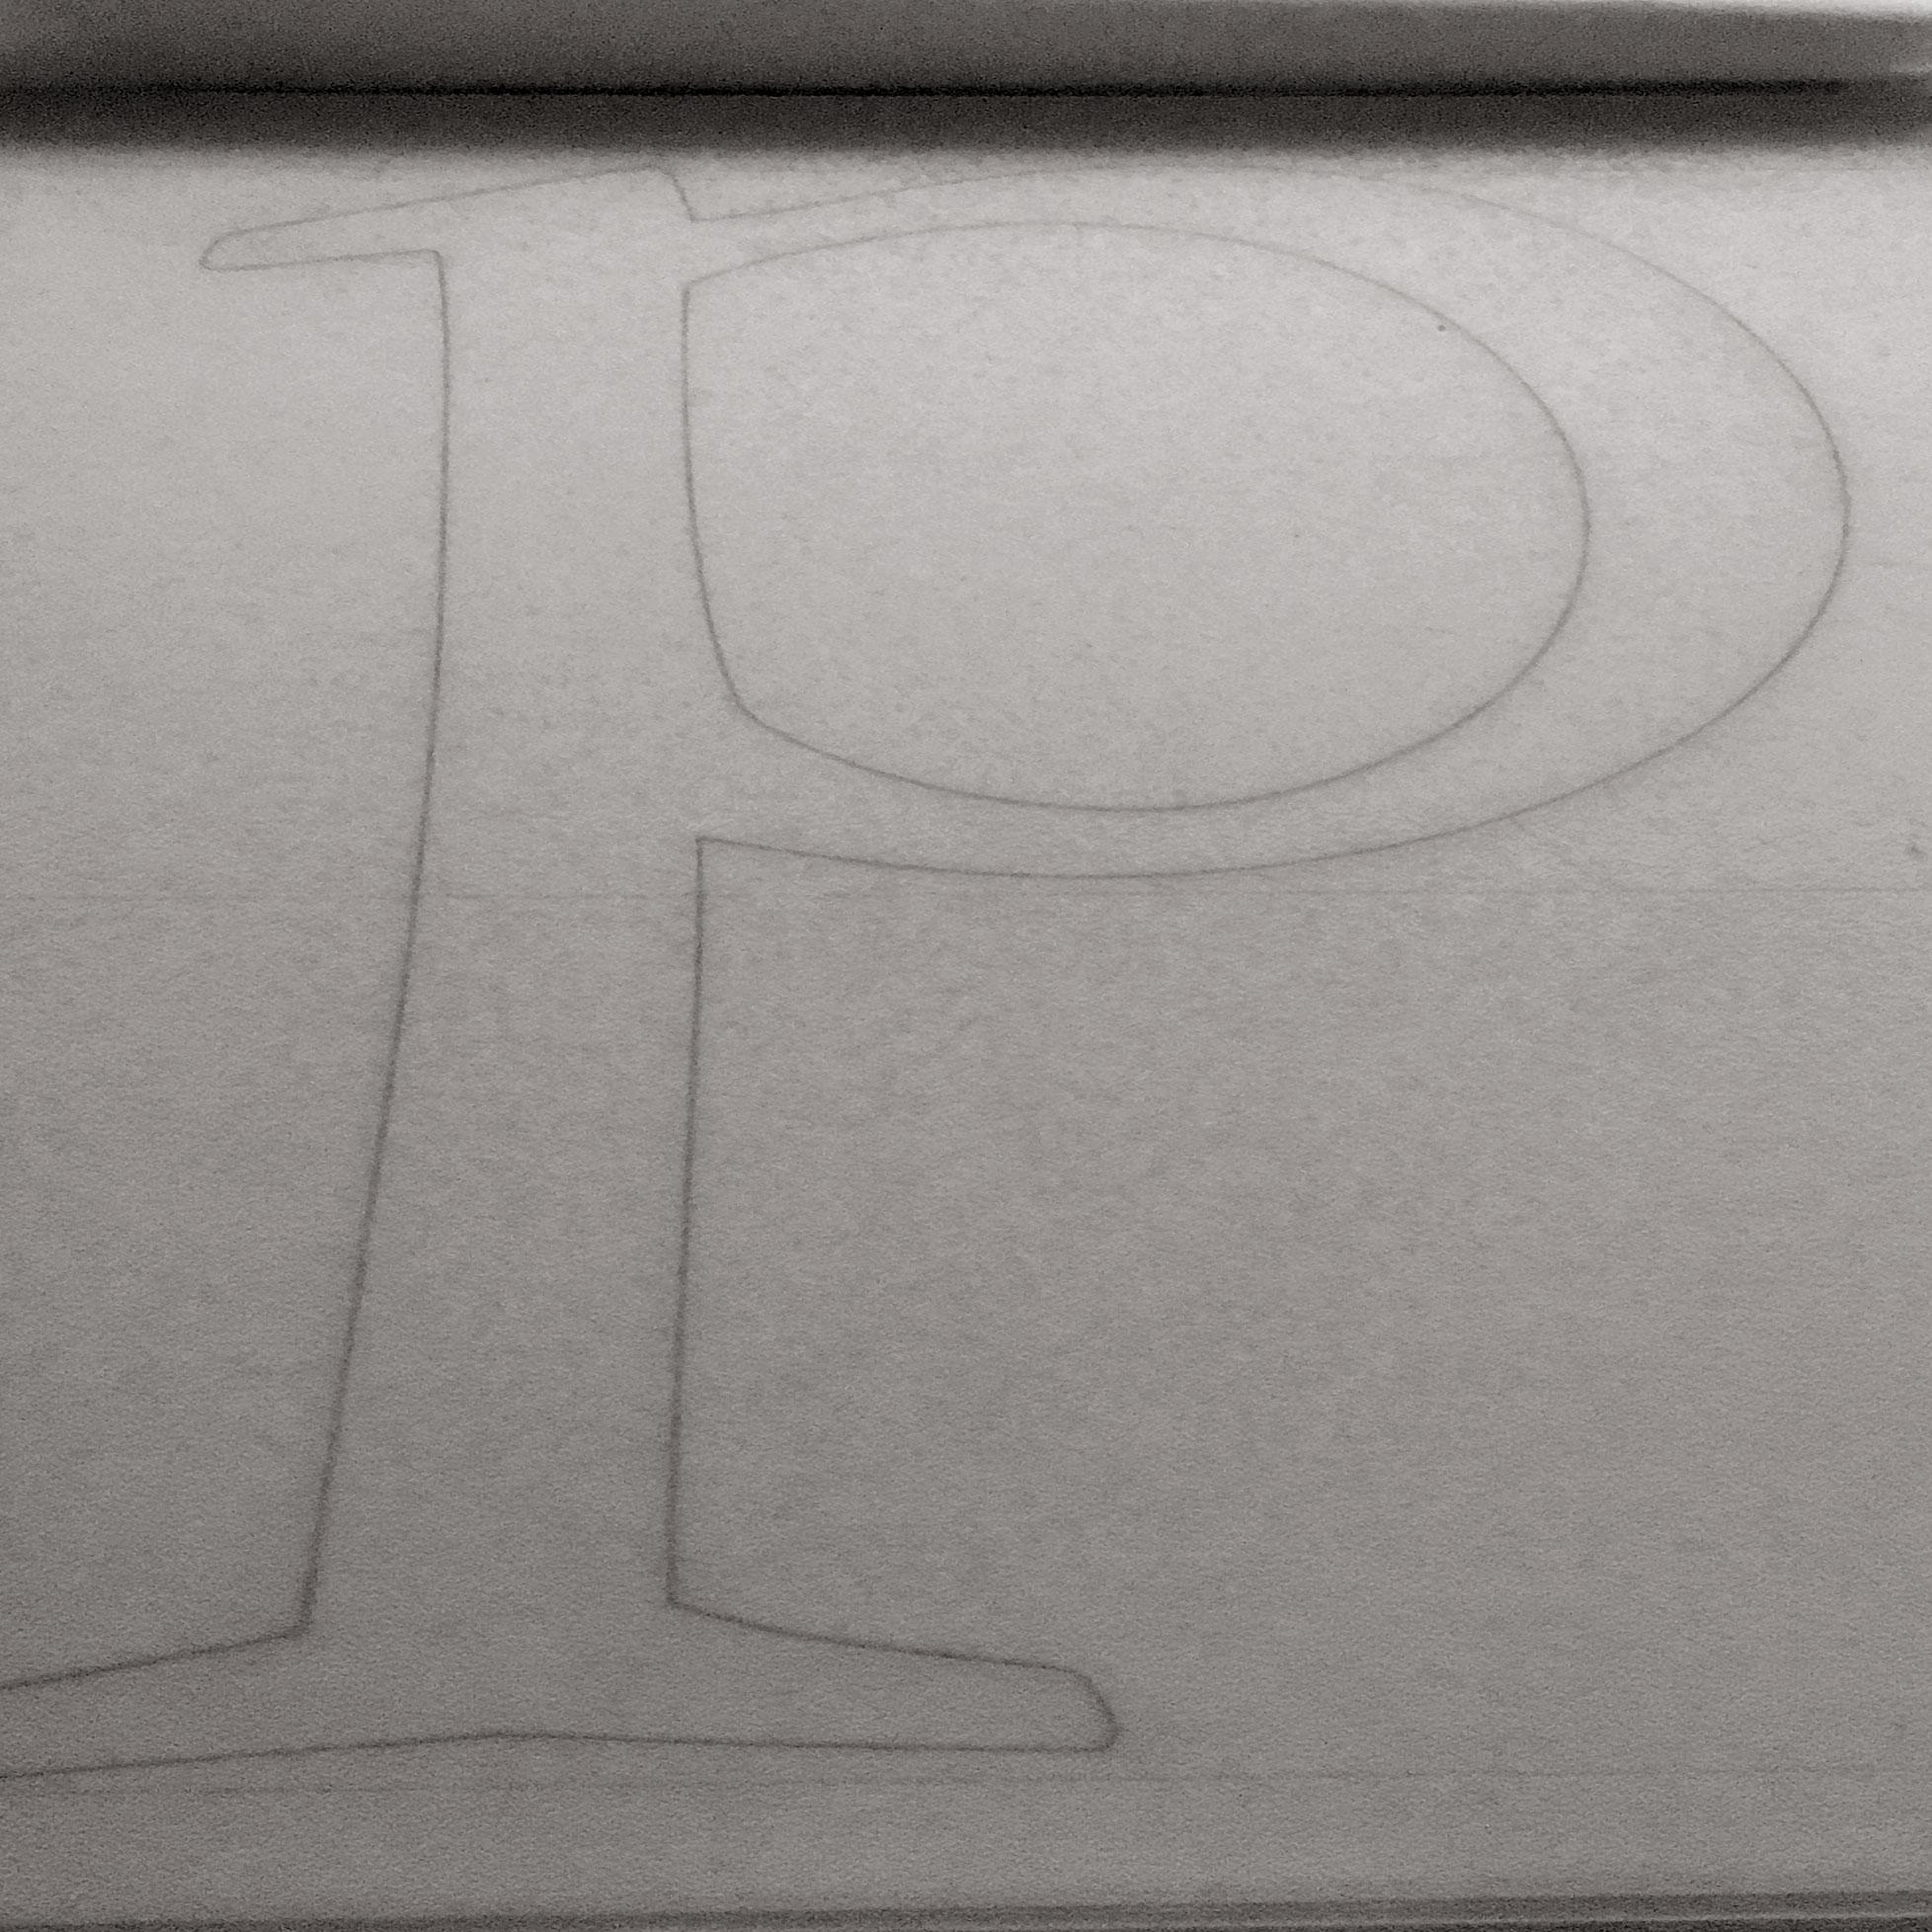 <em>Garamont</em>: My first letter drawings